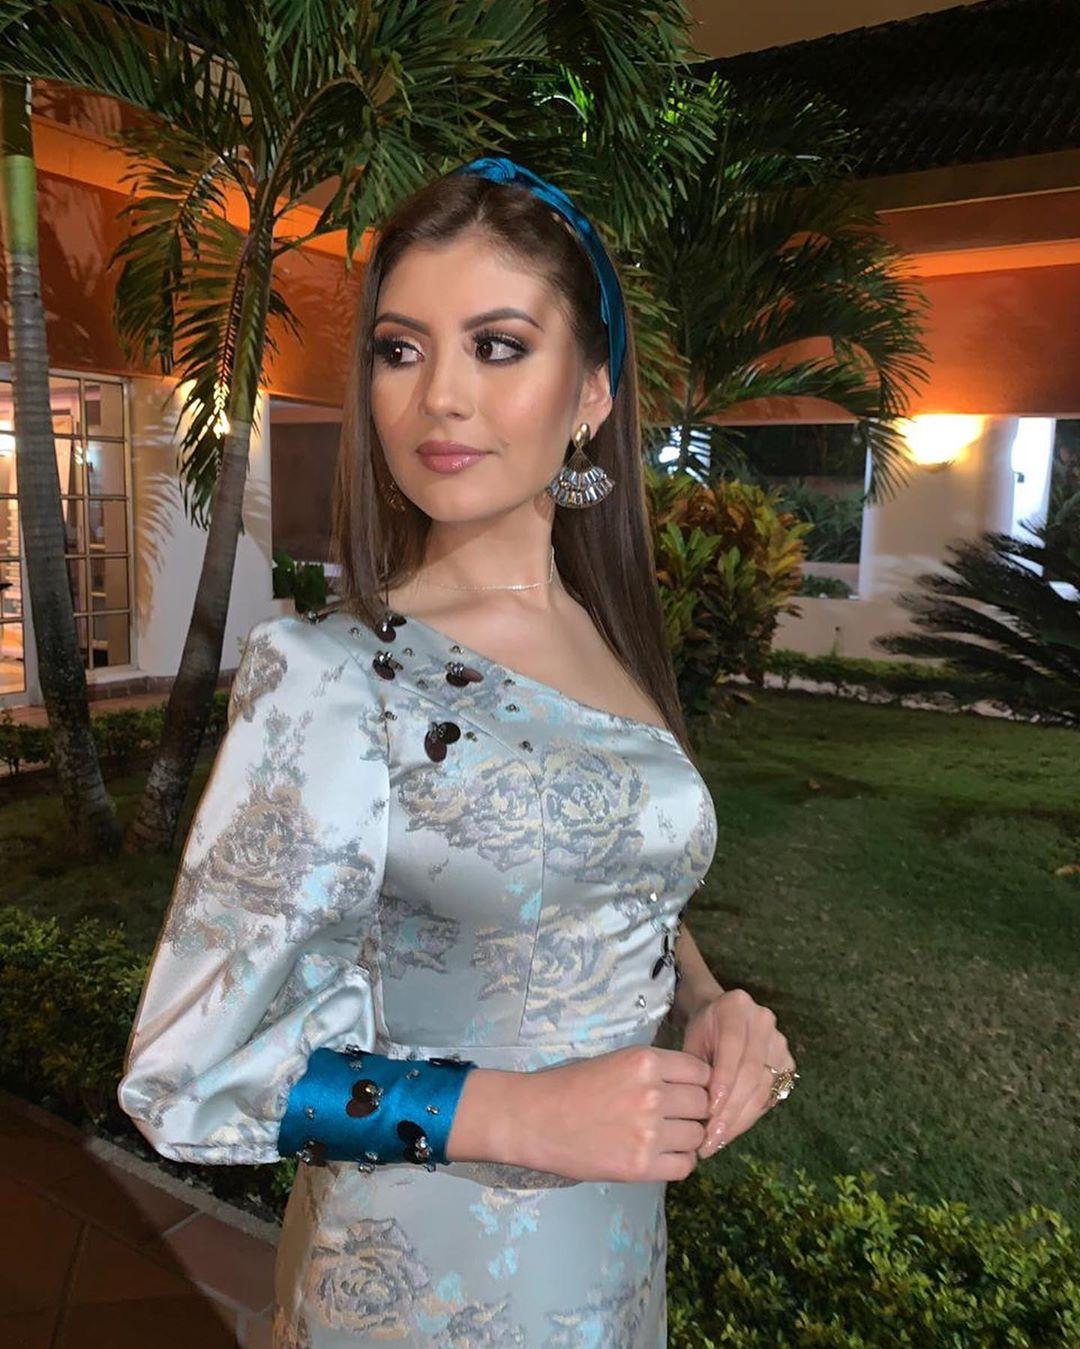 alexandra pinillos, 3ra finalista de reyna mundial banano 2019. - Página 2 69292610